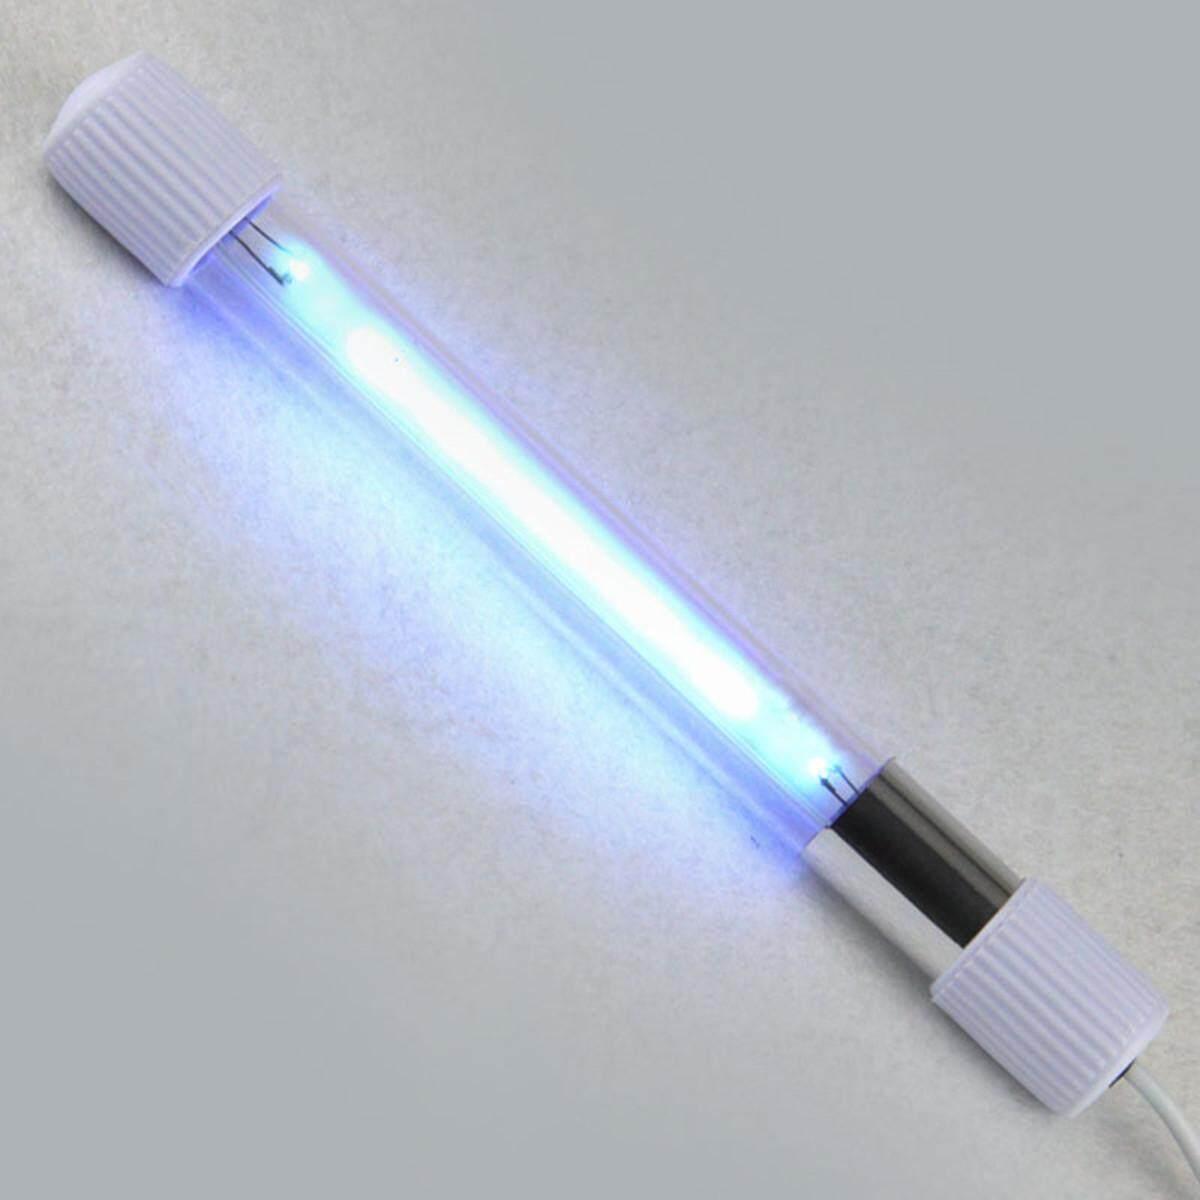 Buy Sell Cheapest 3w Uv Flashlight Best Quality Product Deals Lampu Aquarium Light Yang 15w Submersible Sterilizer Fish Tank Water Germicidal Lamp Ultraviolet